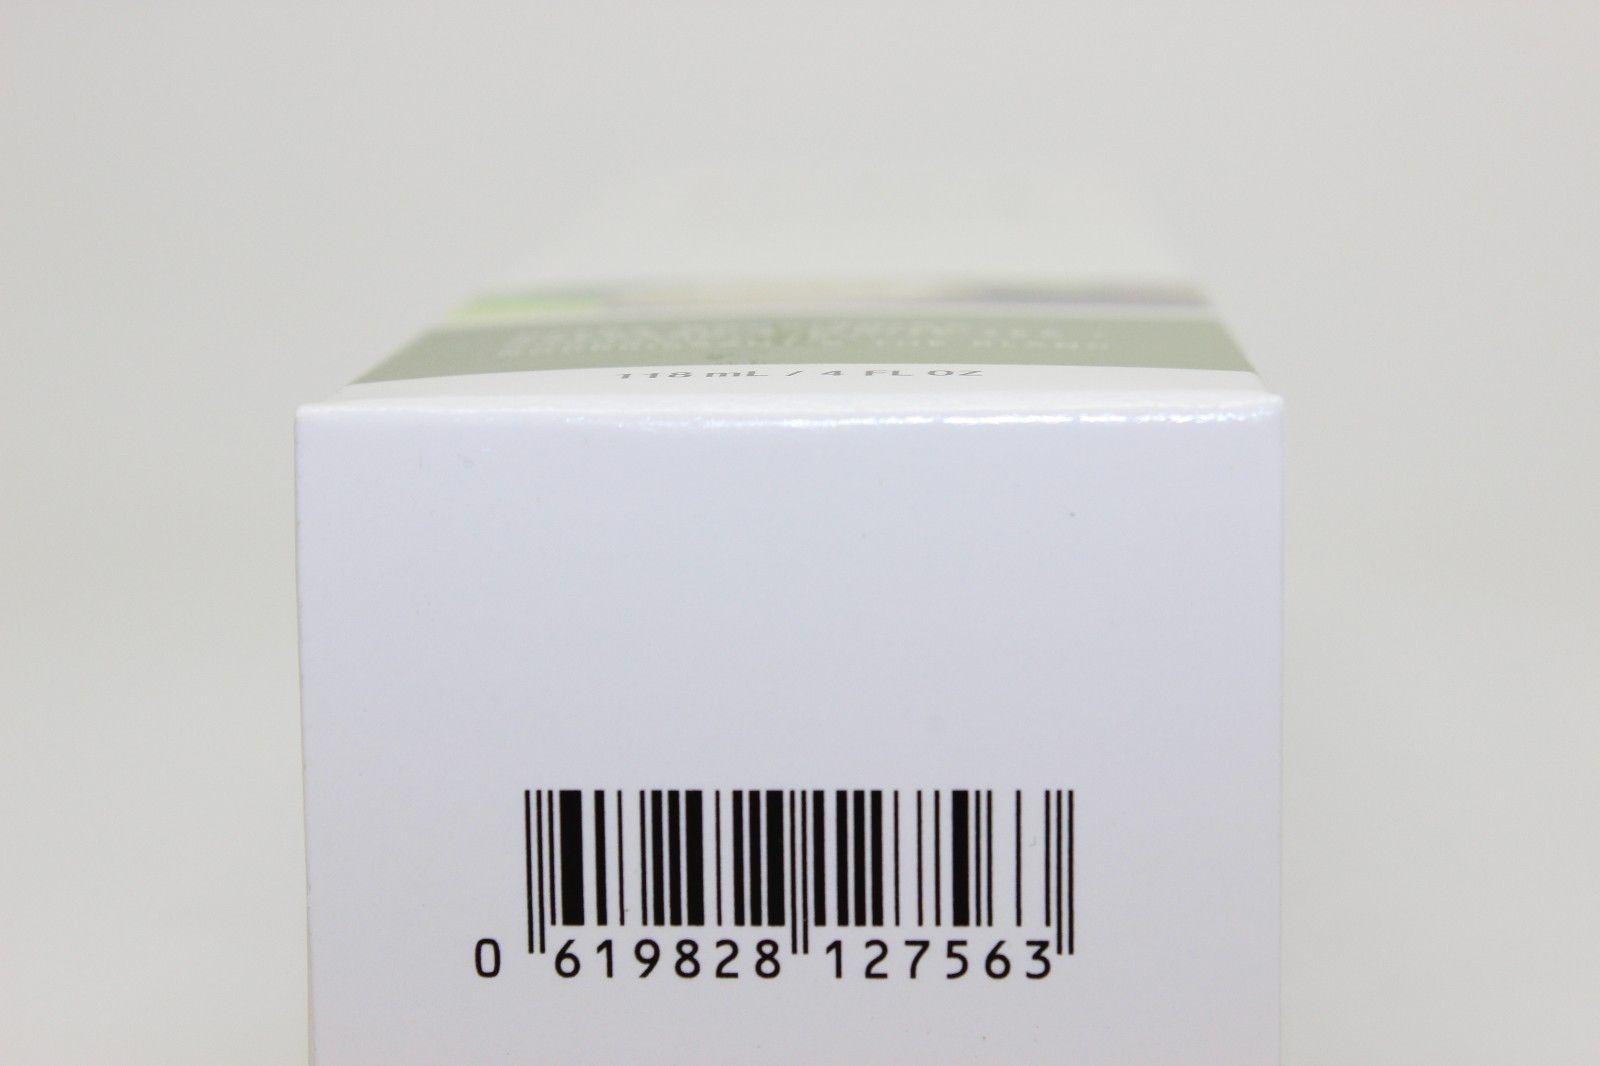 ASM01 - OPI Pro SPA Micro-Exfoliating Hand Polish 118mL / 4 Fl Oz. - NEW